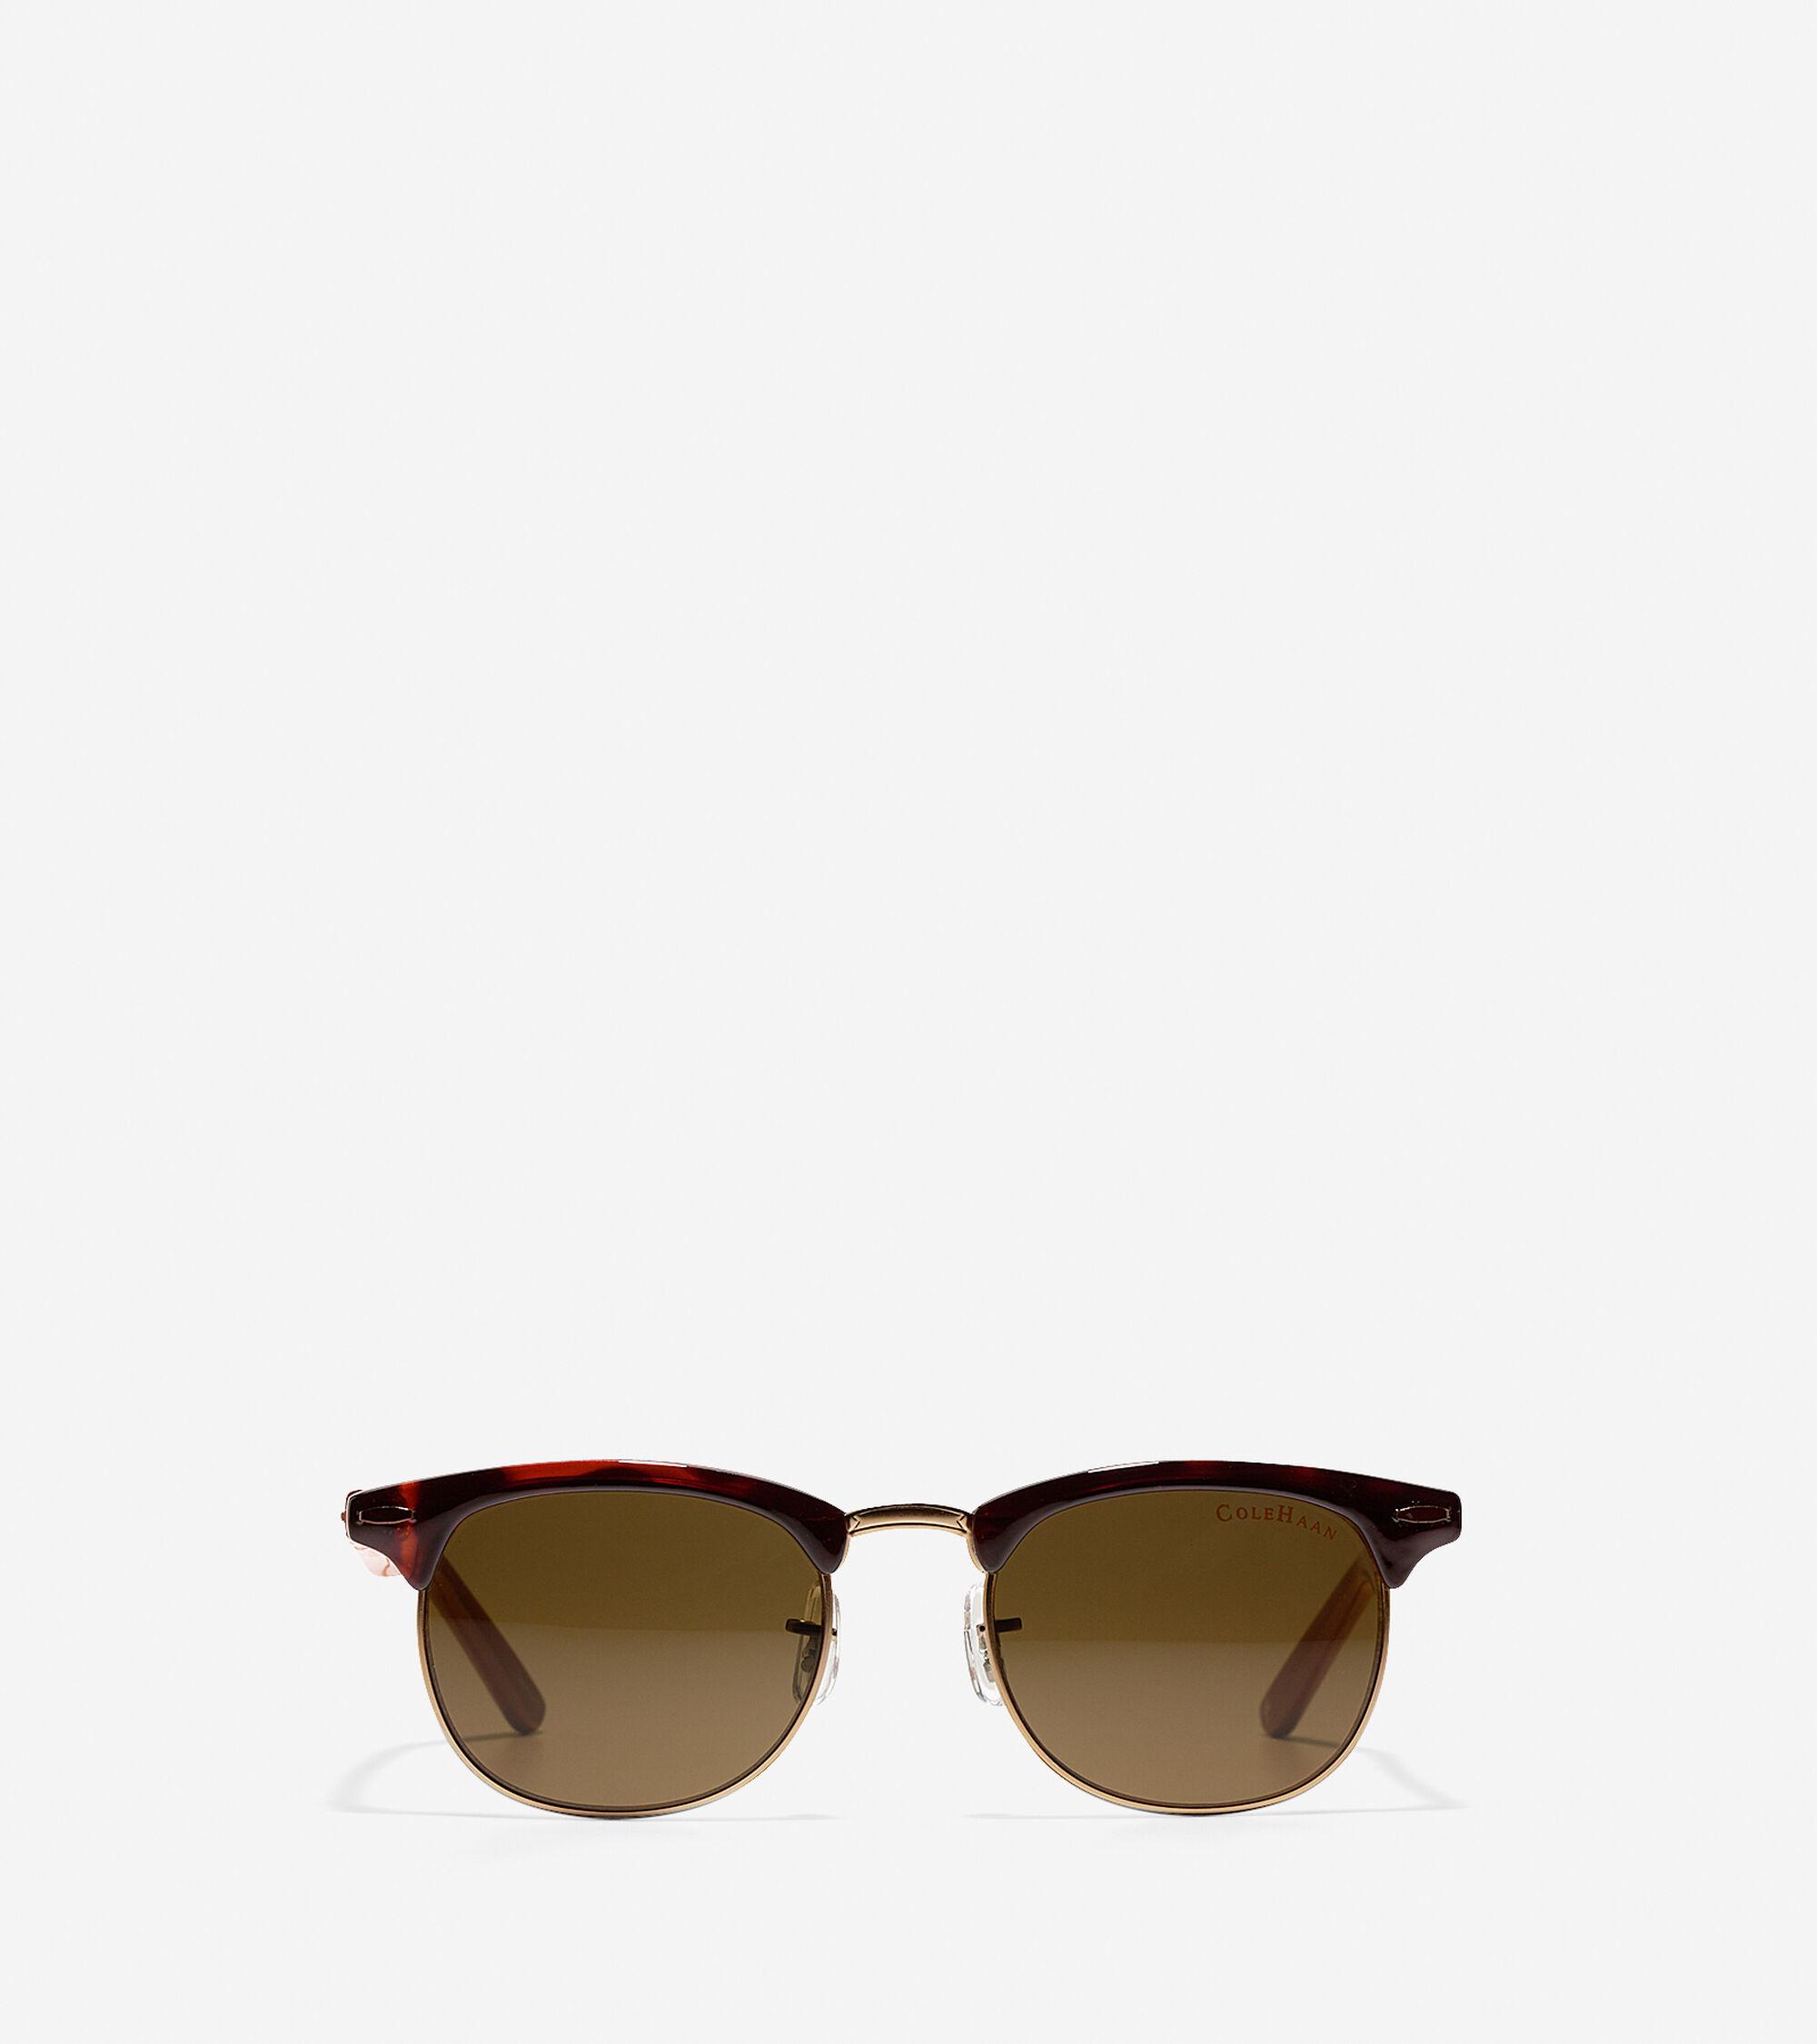 Accessories > Club Commander Sunglasses